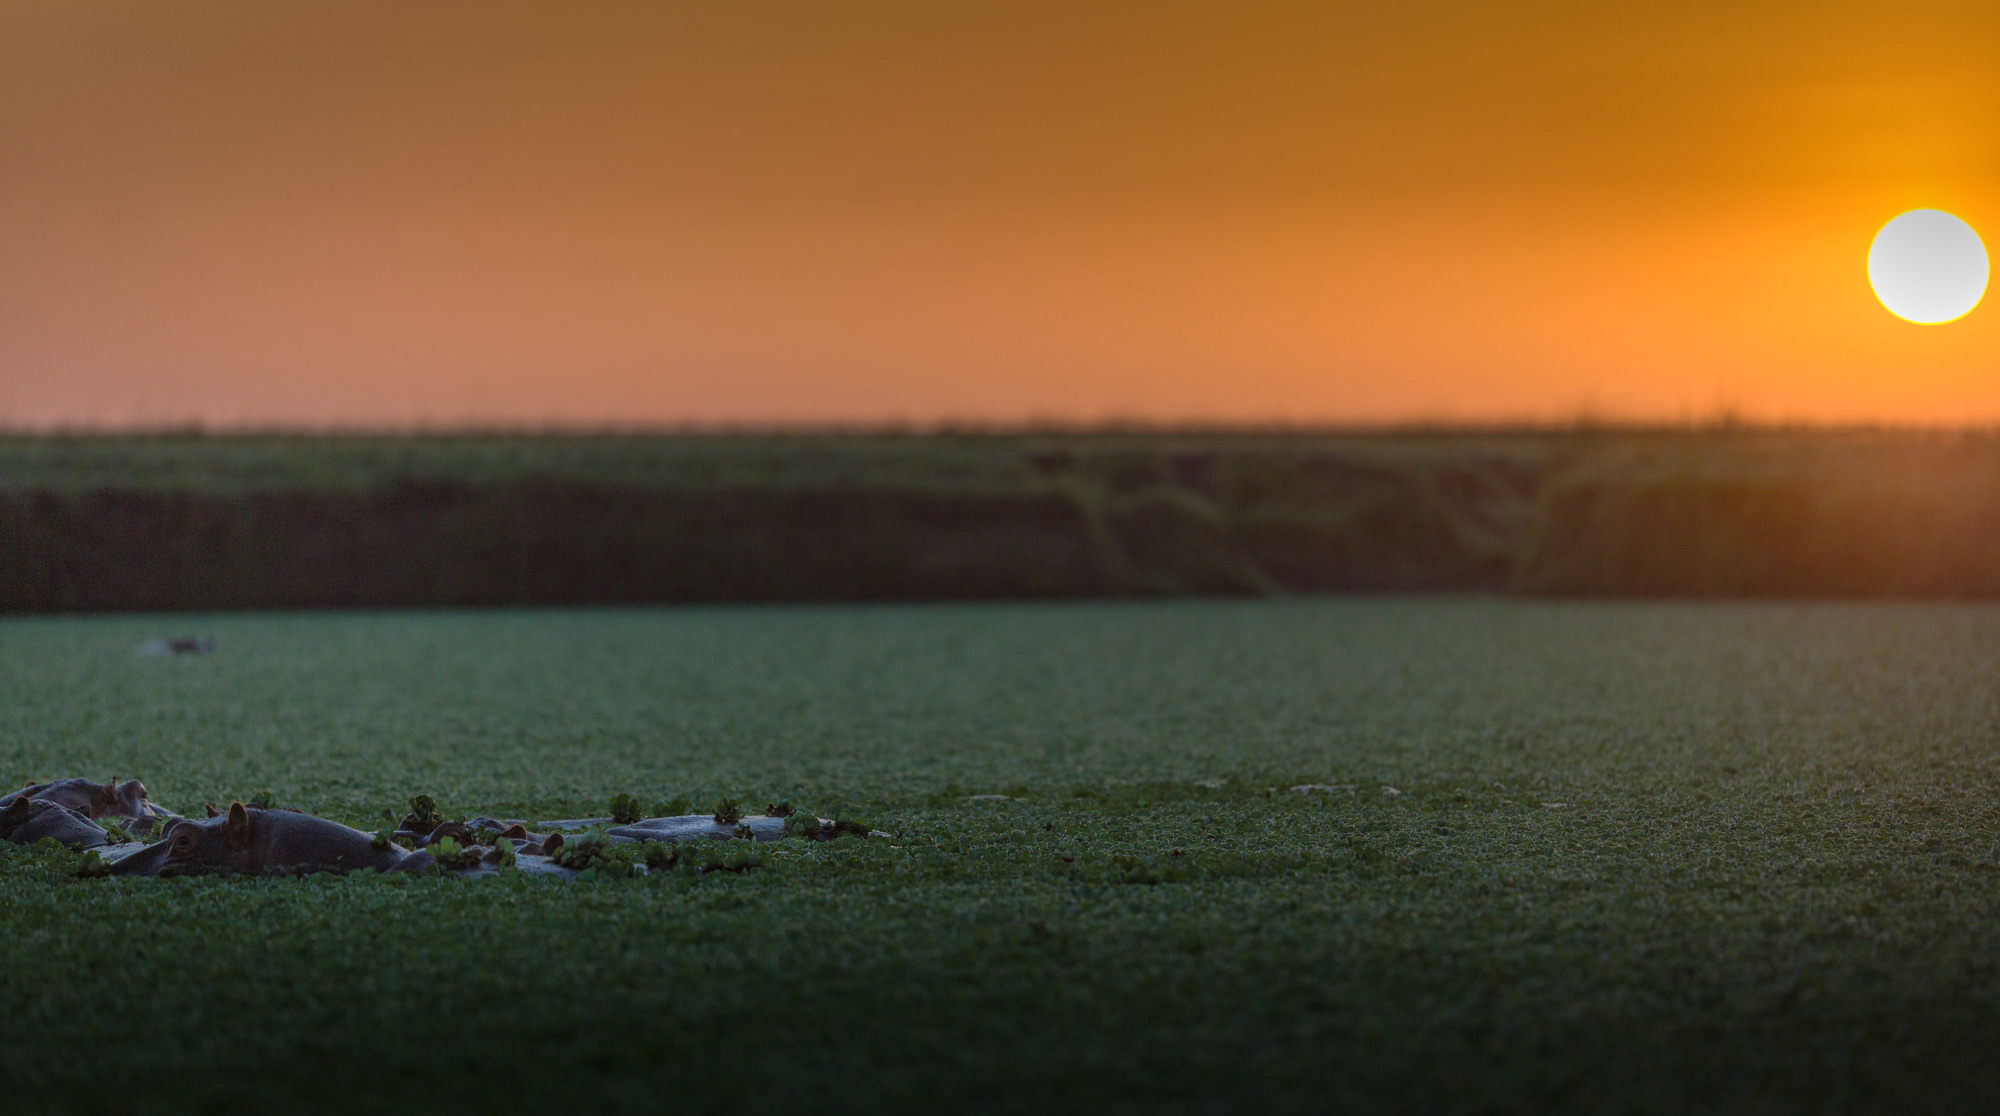 Maasai Mara A spectacular sunrise with hippos ©Ruzdi Ekenheim